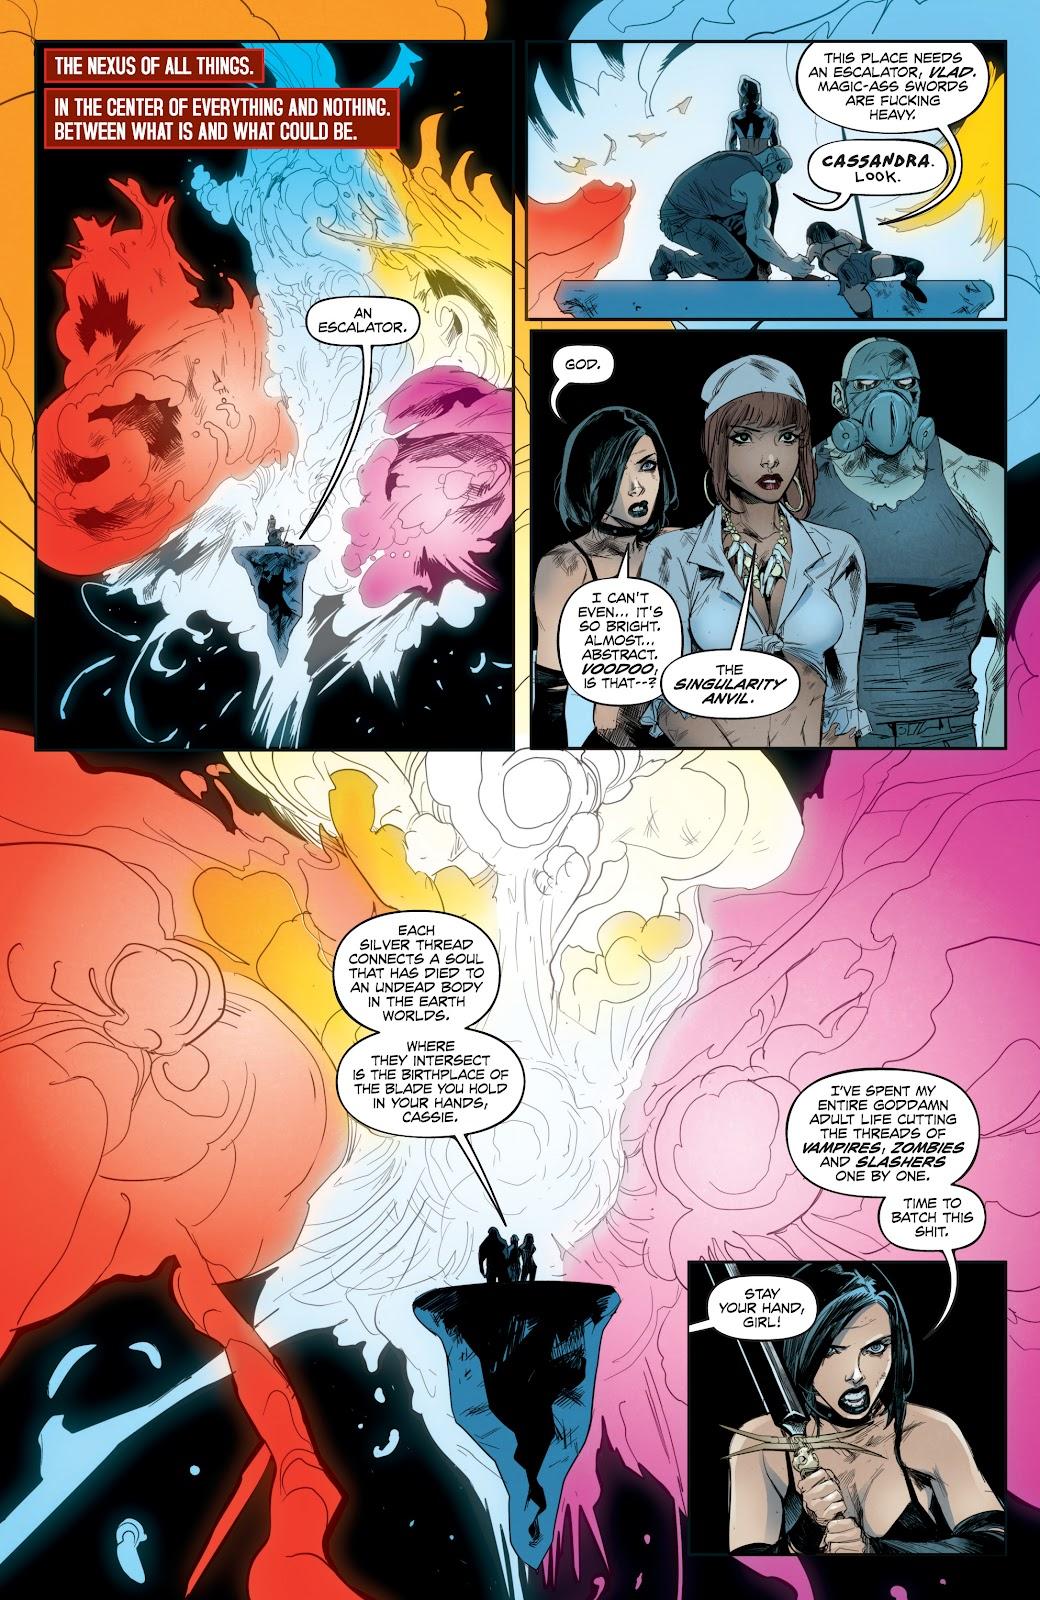 Read online Hack/Slash vs. Chaos comic -  Issue #4 - 5